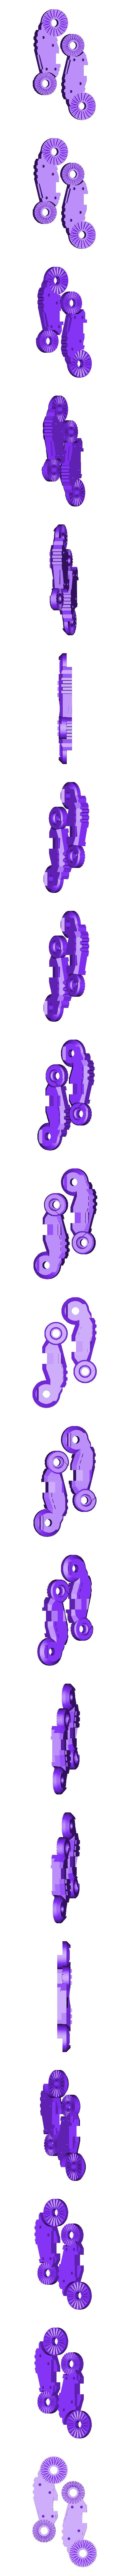 LegT2_Right_04_Black.stl Download STL file Heavy Gun Walker • 3D print design, Jwoong